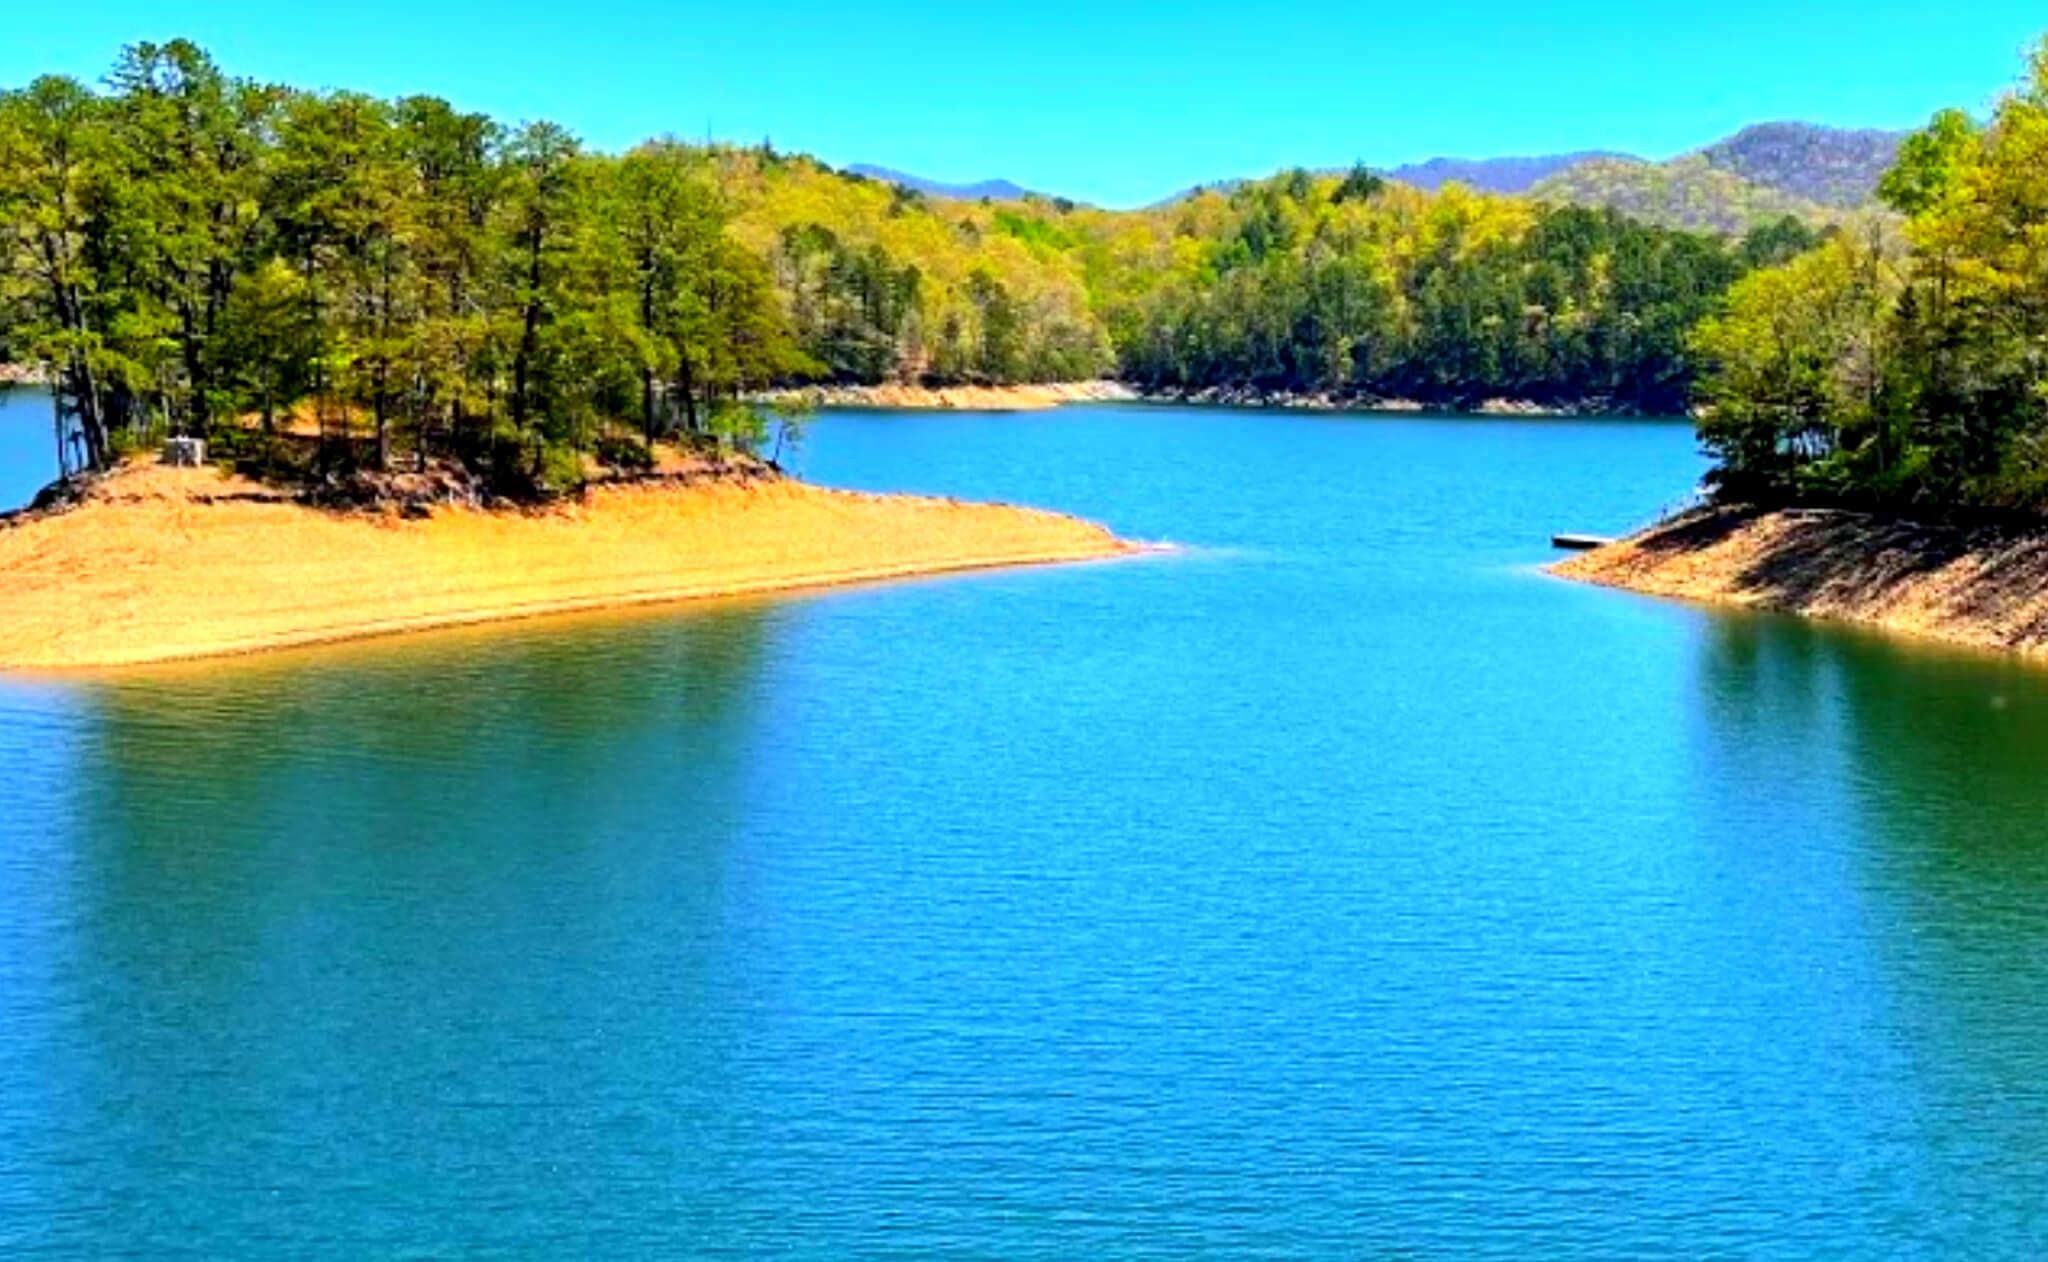 Fontana-Lake-Fishing-Report-Guide-North-Carolina-NC-03